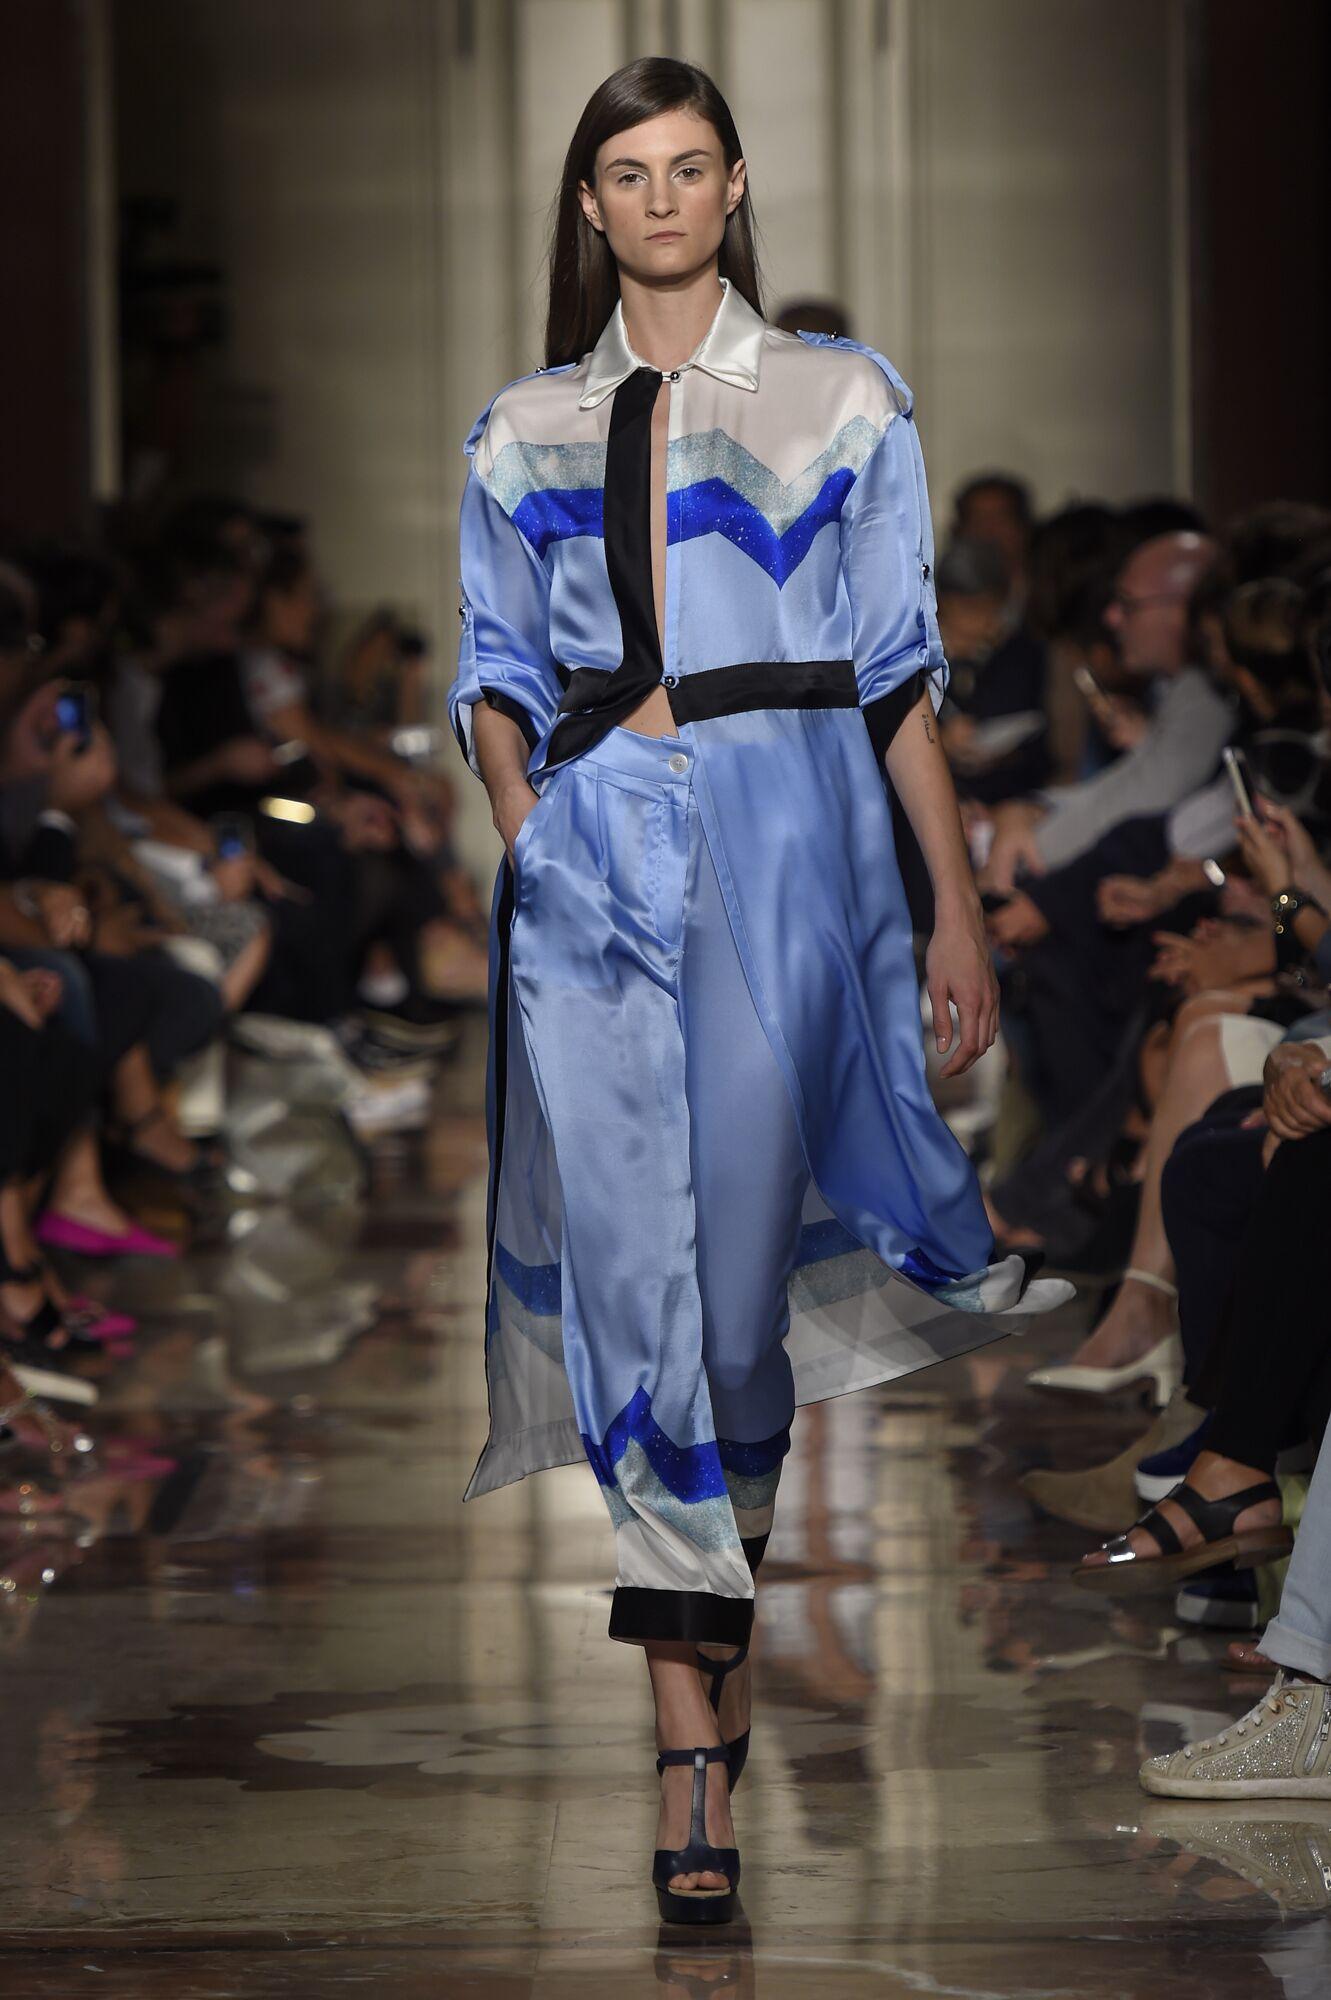 Andrea Incontri Milan Fashion Week Collection